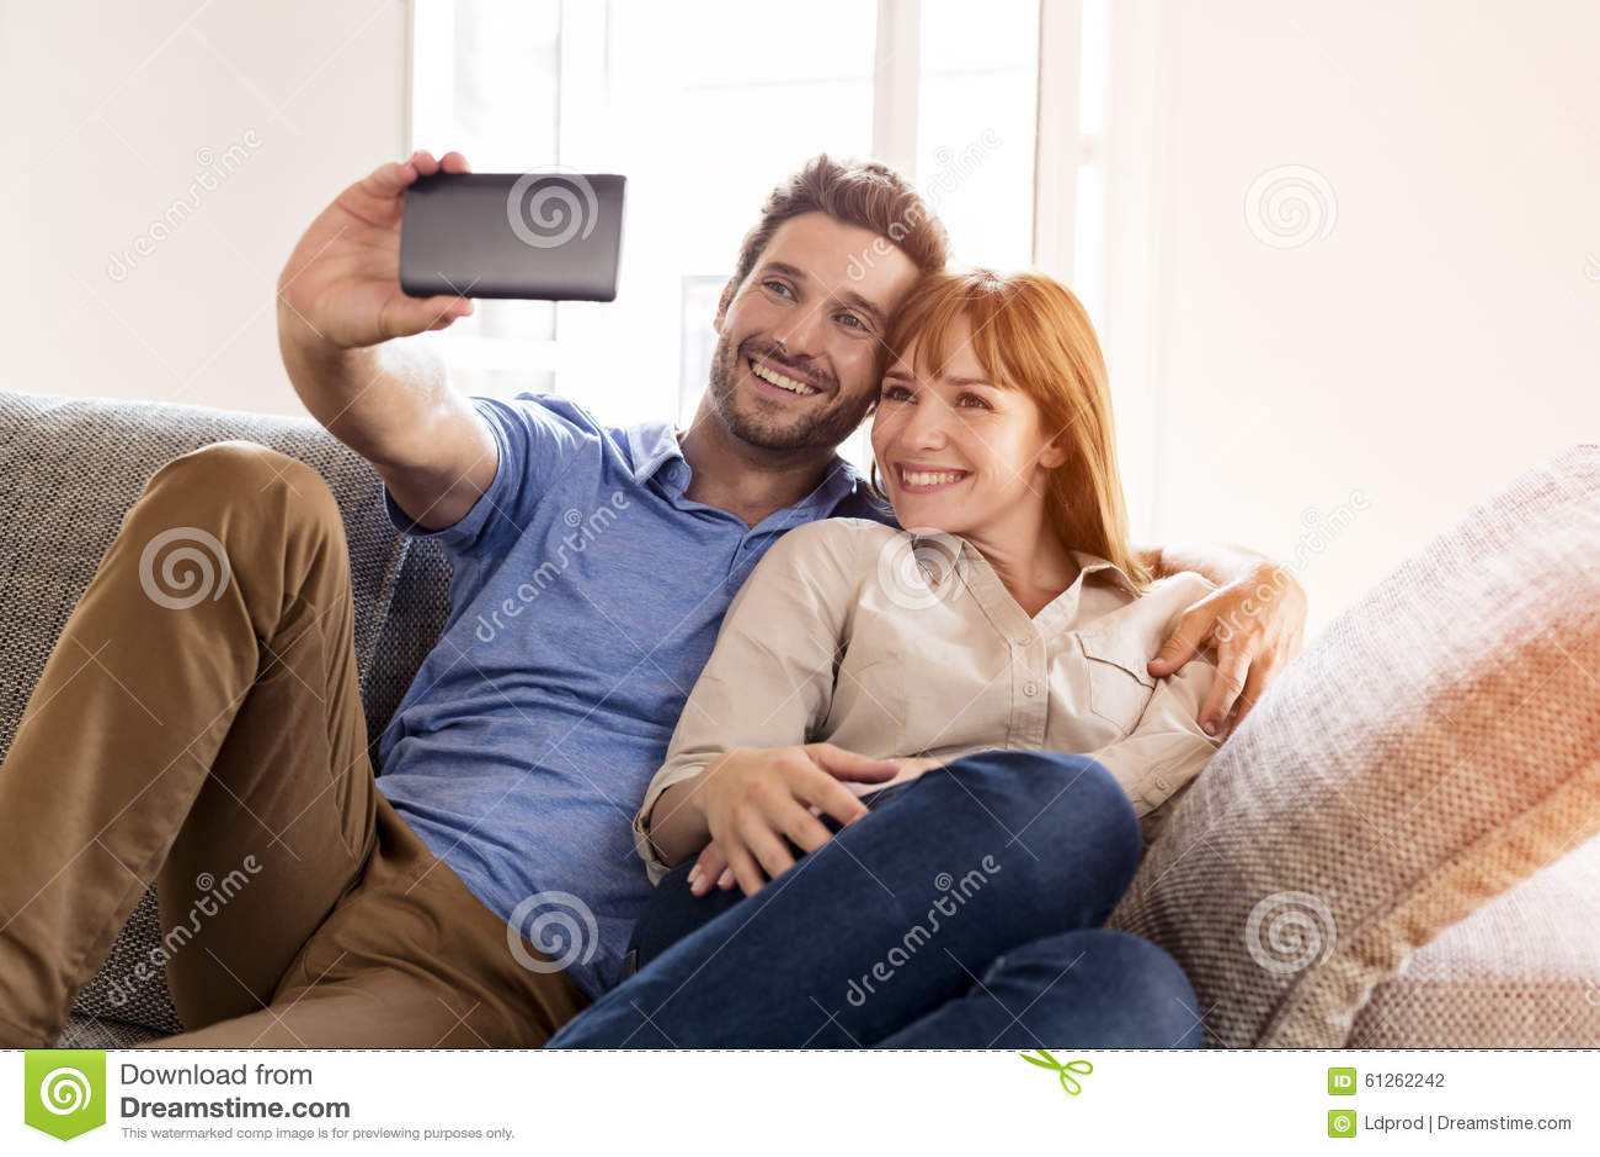 home love making videos